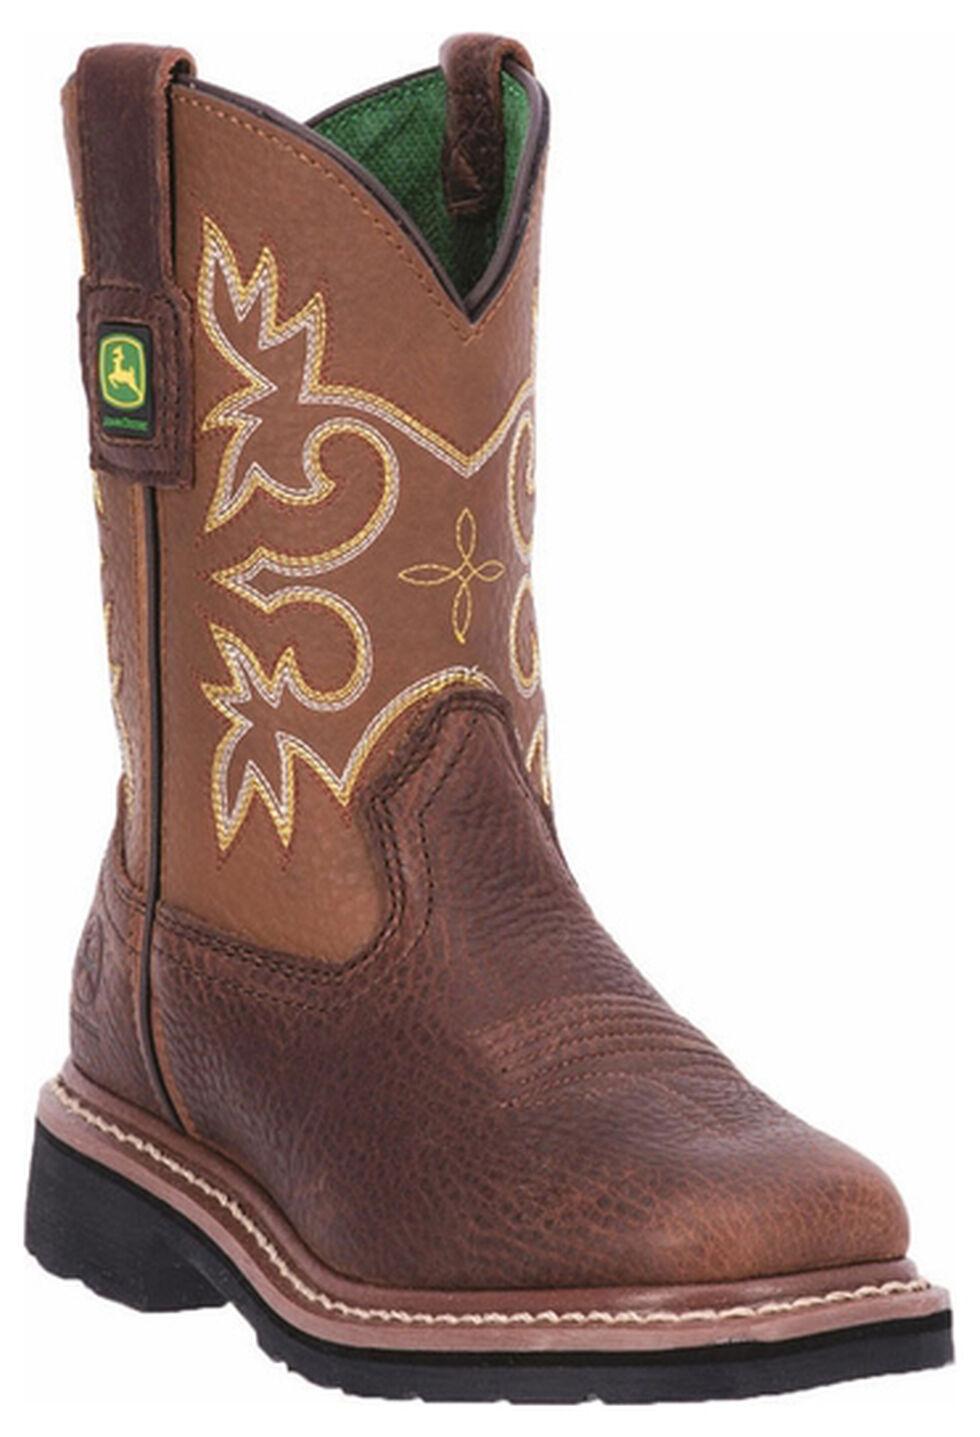 John Deere Boys' Johnny Popper Mesquite Western Boots - Square Toe, Mesquite, hi-res